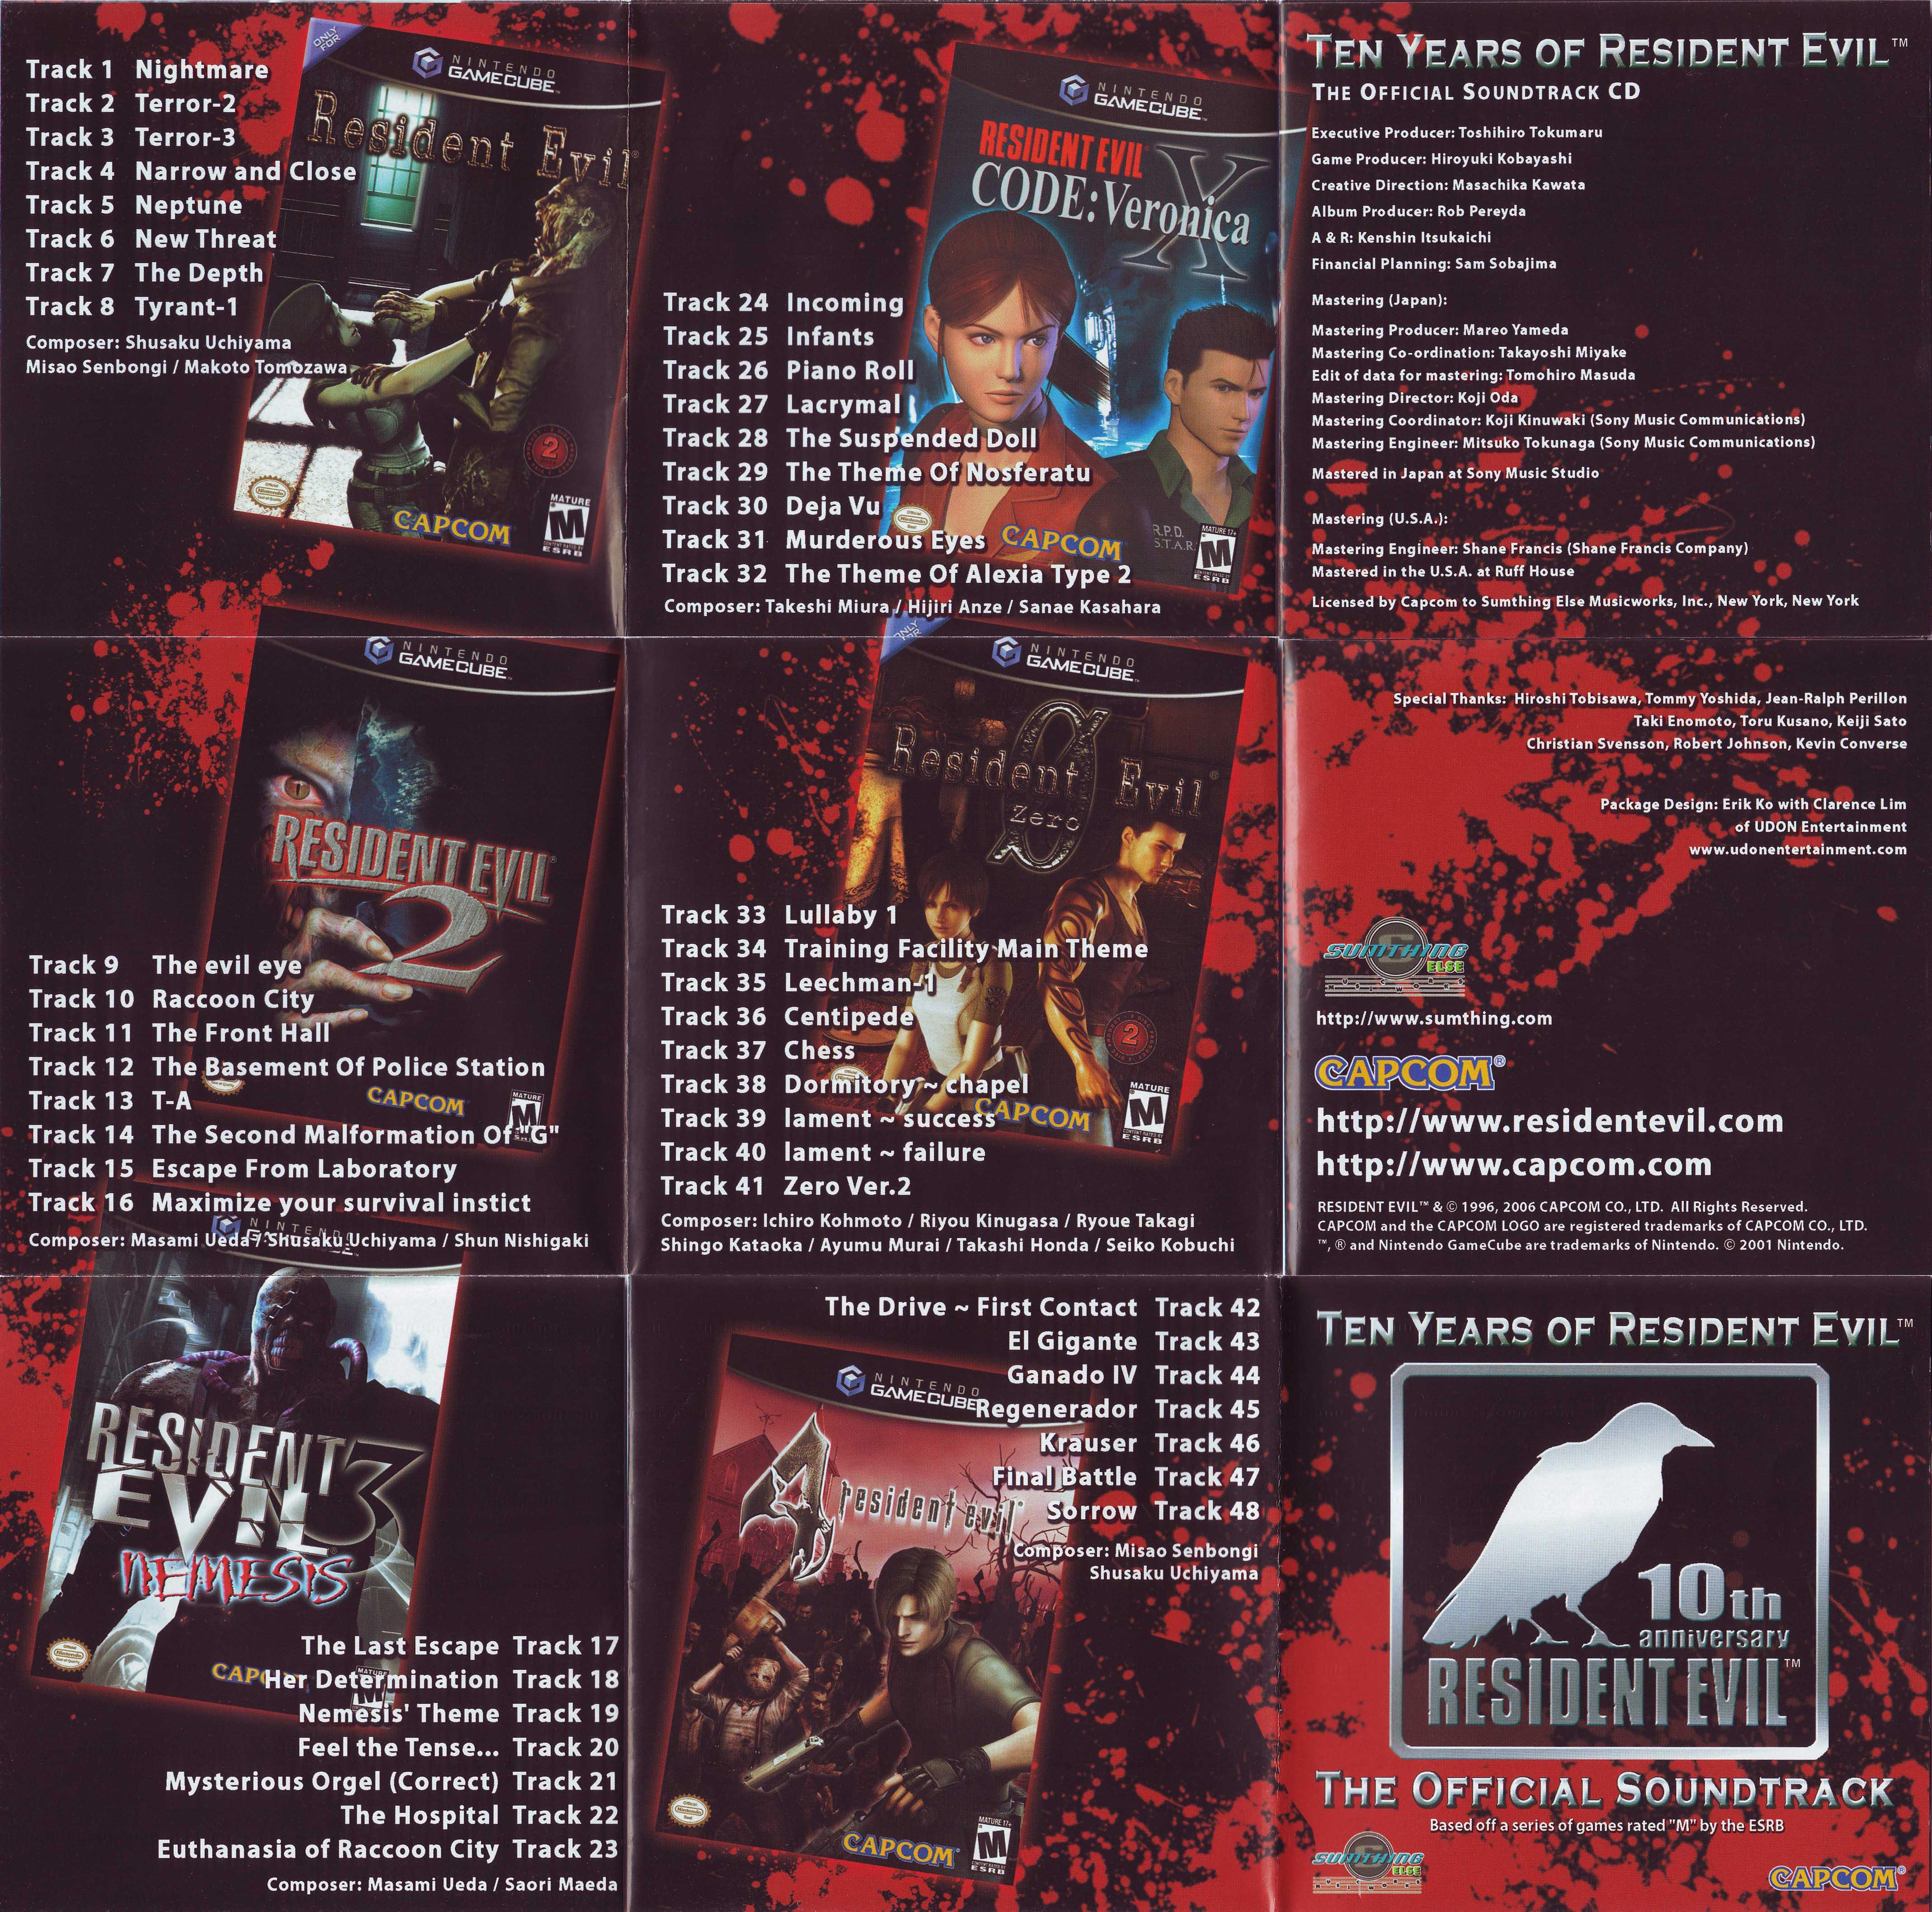 Ten Years Of Resident Evil The Official Soundtrack Muzyka Iz Igry